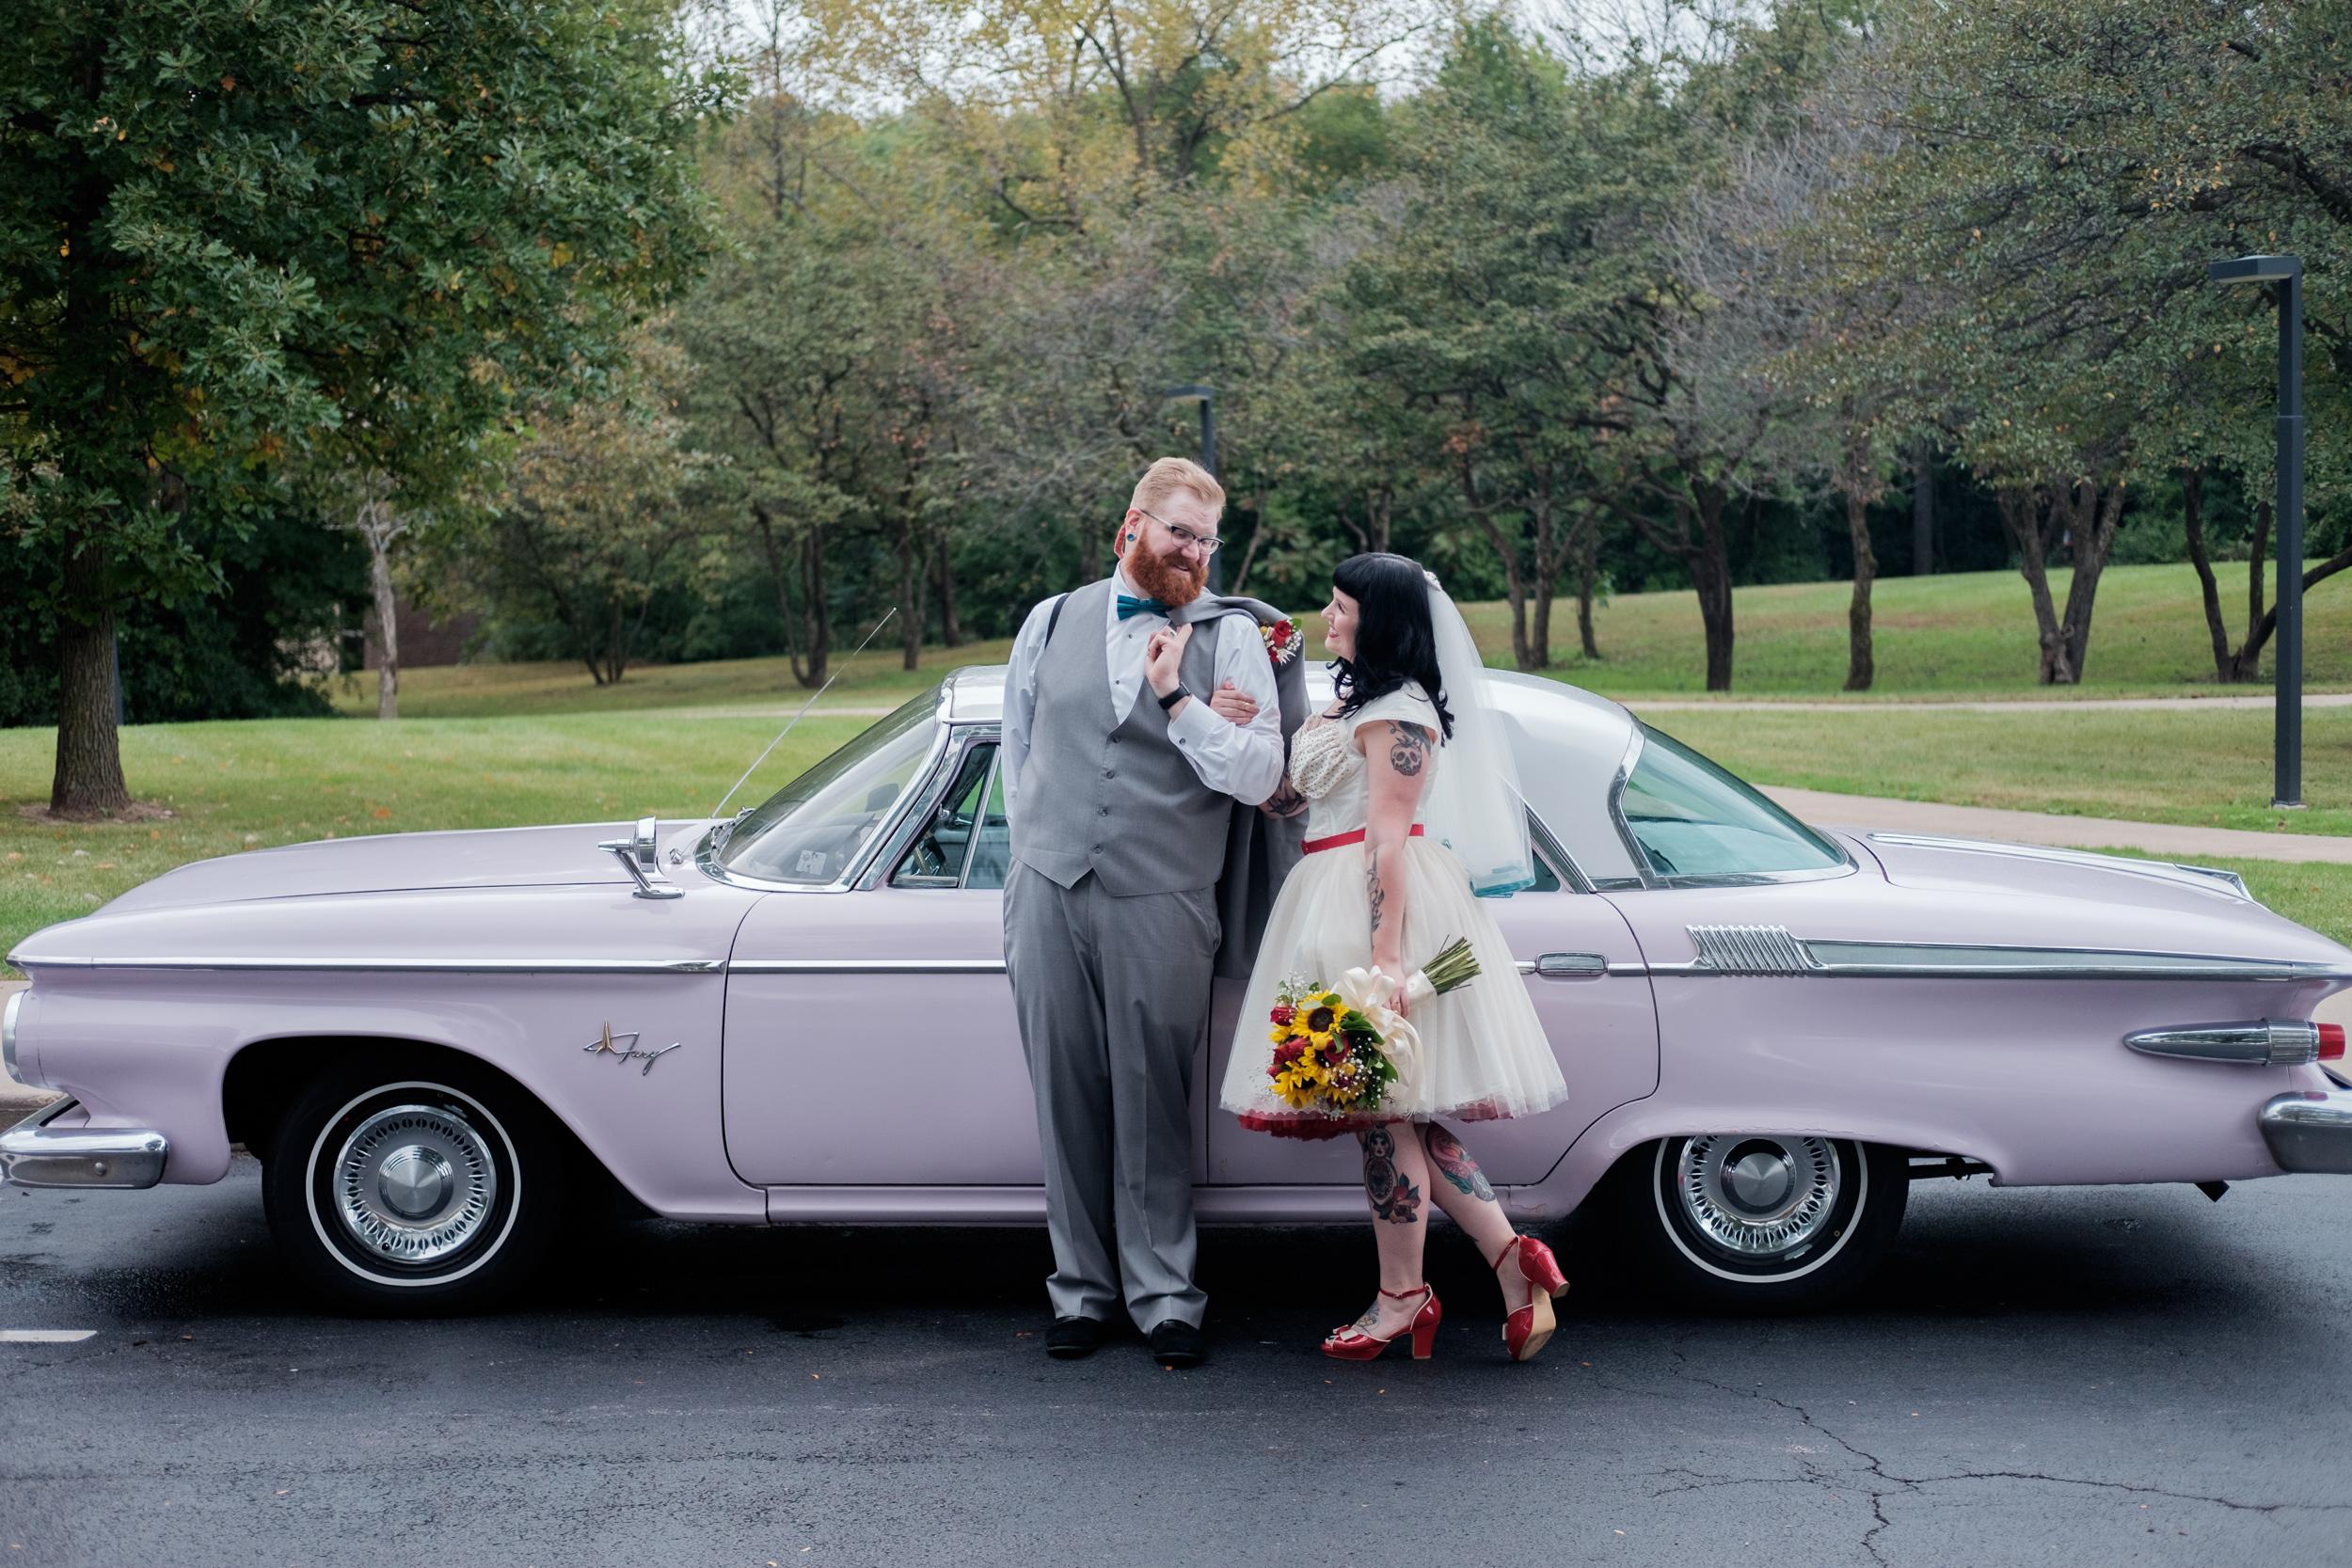 Christian & Sarah wedding photography by Brian milo-179.jpg